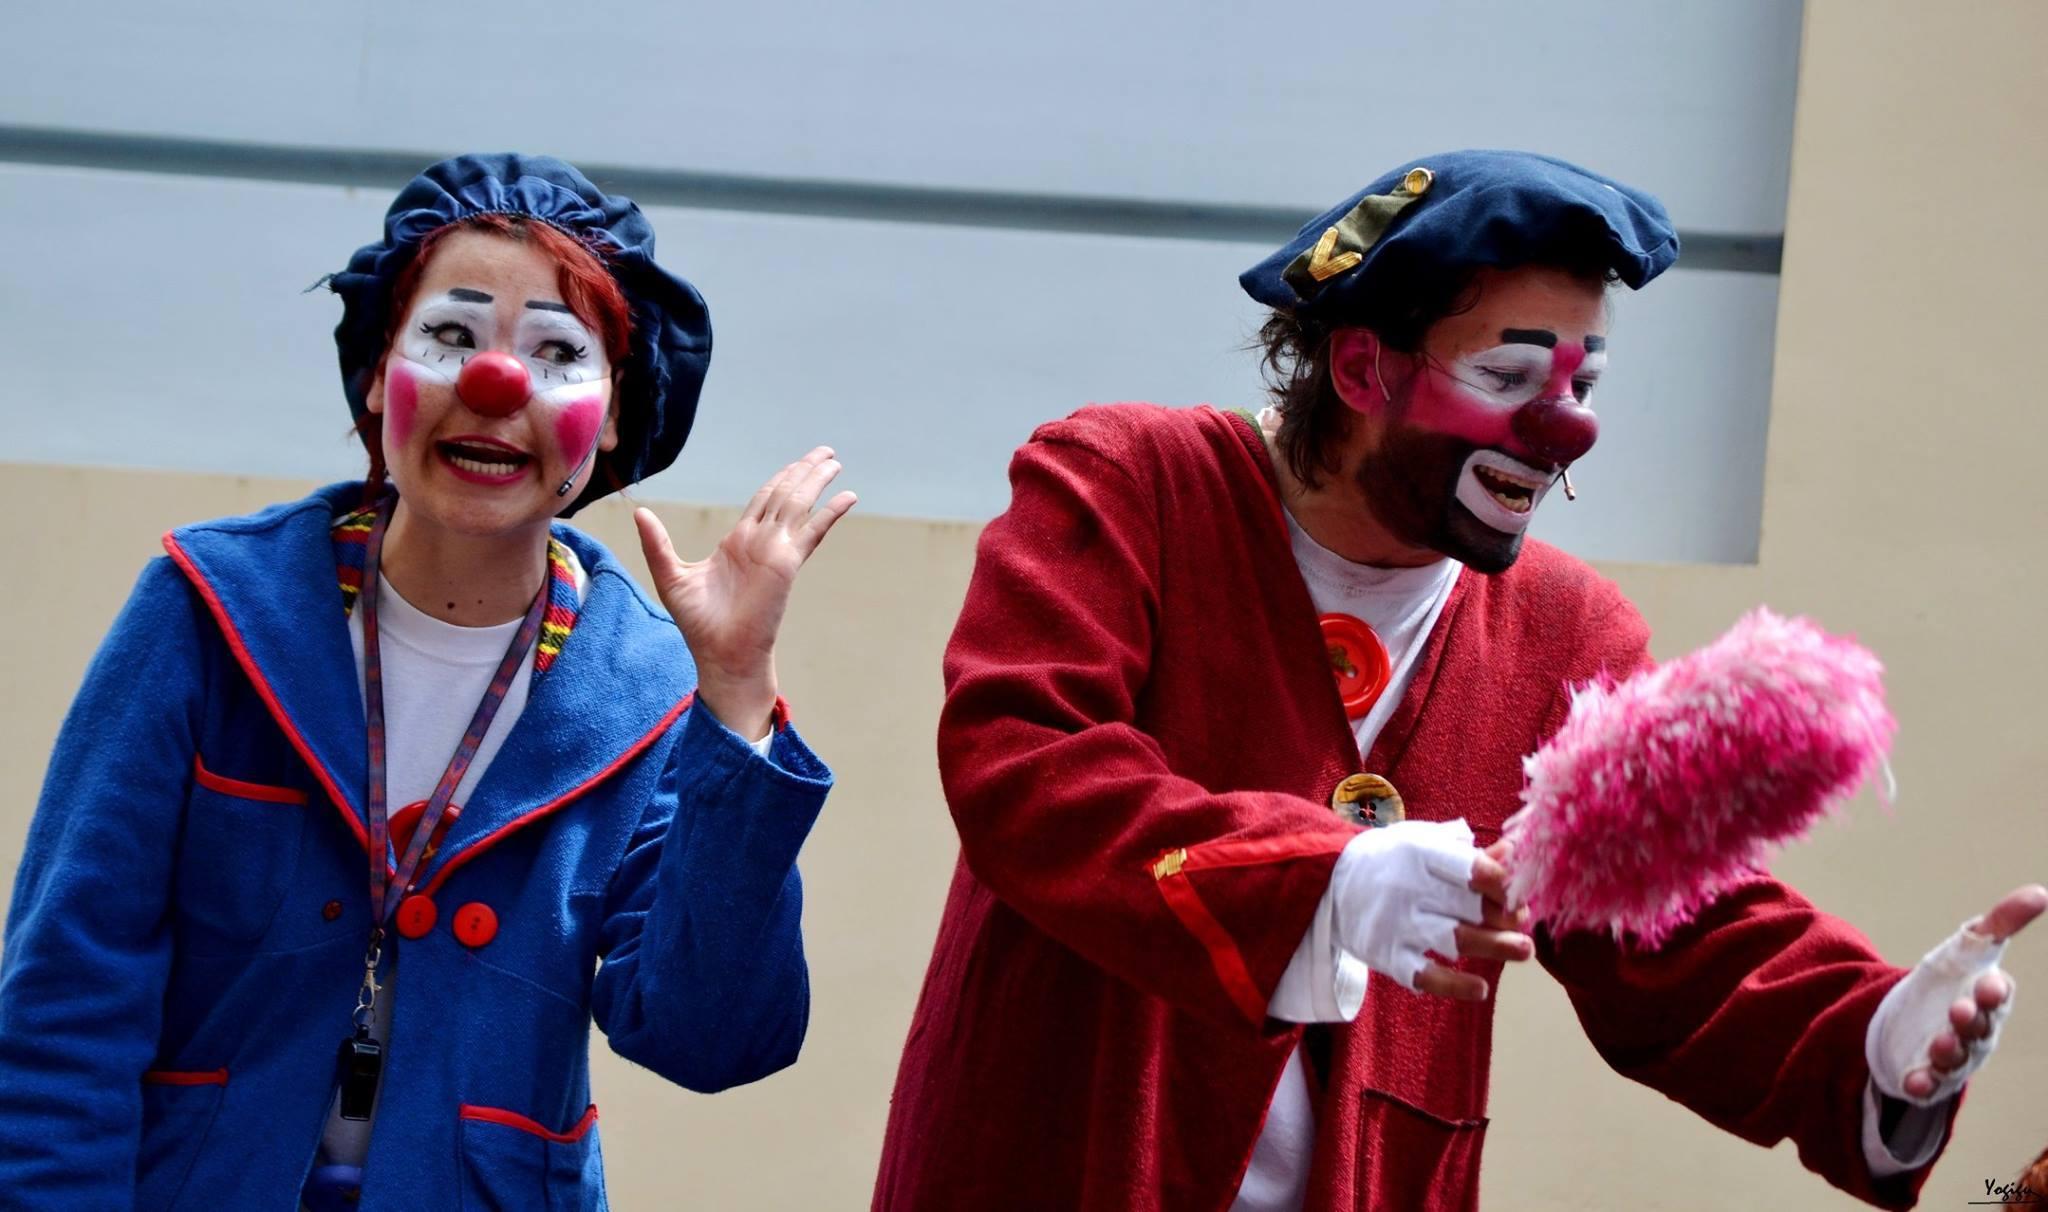 Clownbaret traerá 'Clównbate'